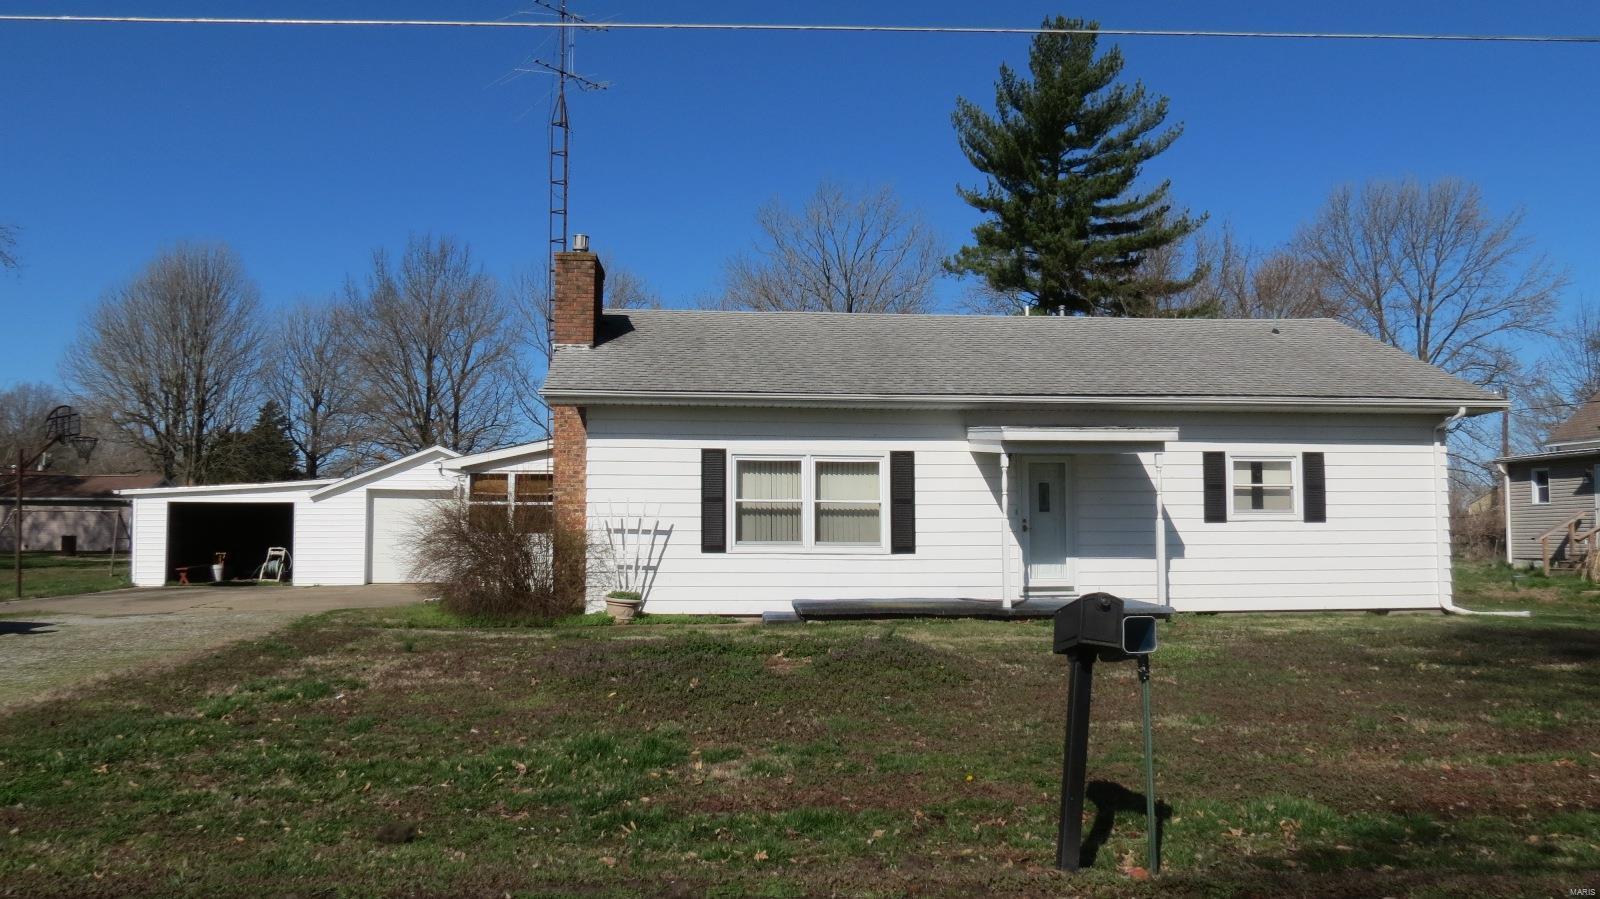 223 North Hickory Property Photo - Tamaroa, IL real estate listing